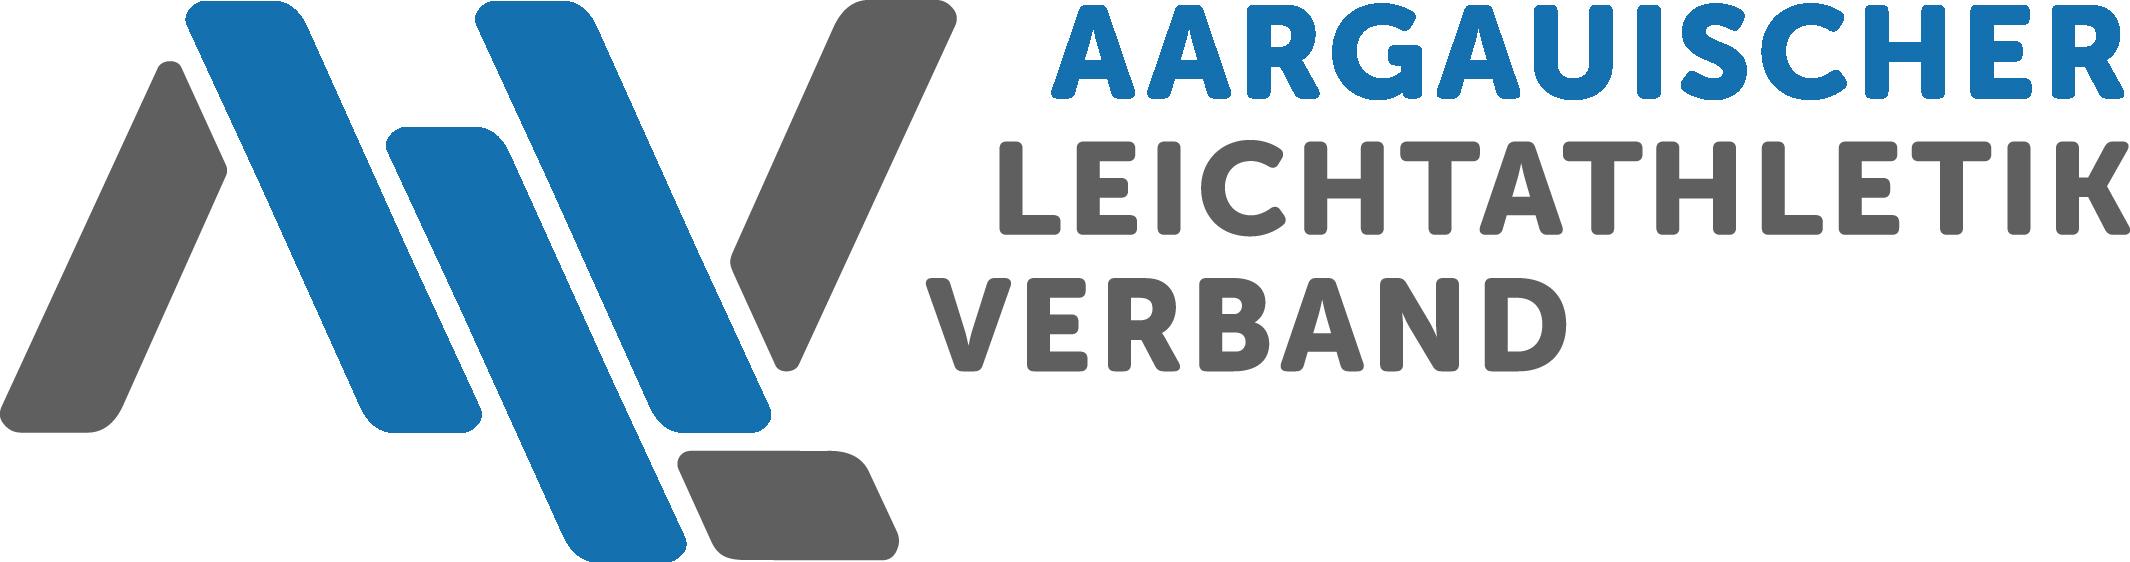 Logo AKTUELL.jpg